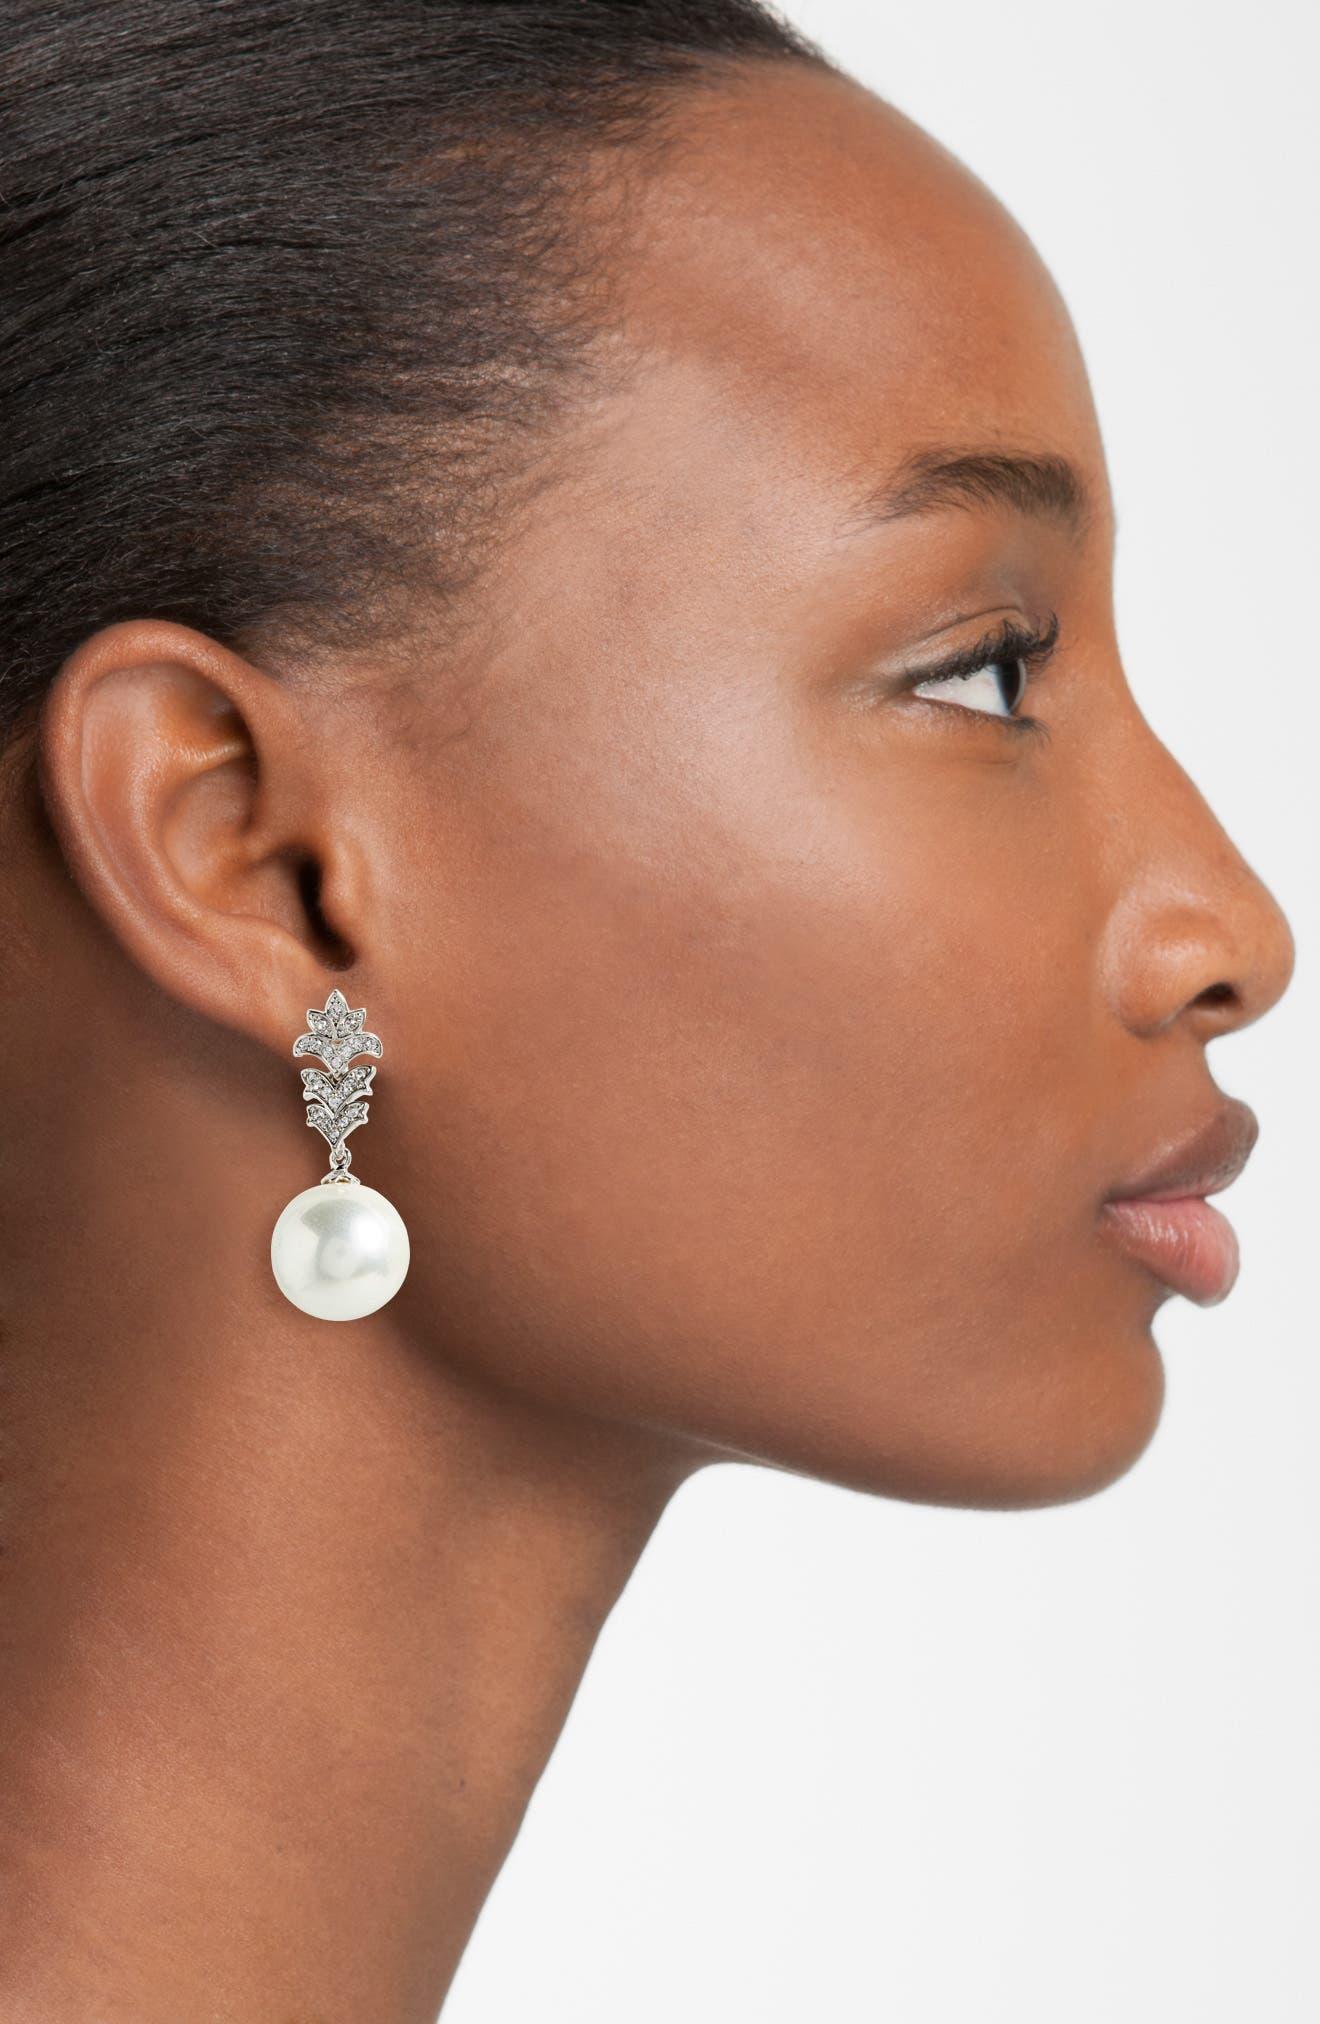 Imitation Pearl Drop Earrings,                             Alternate thumbnail 2, color,                             040